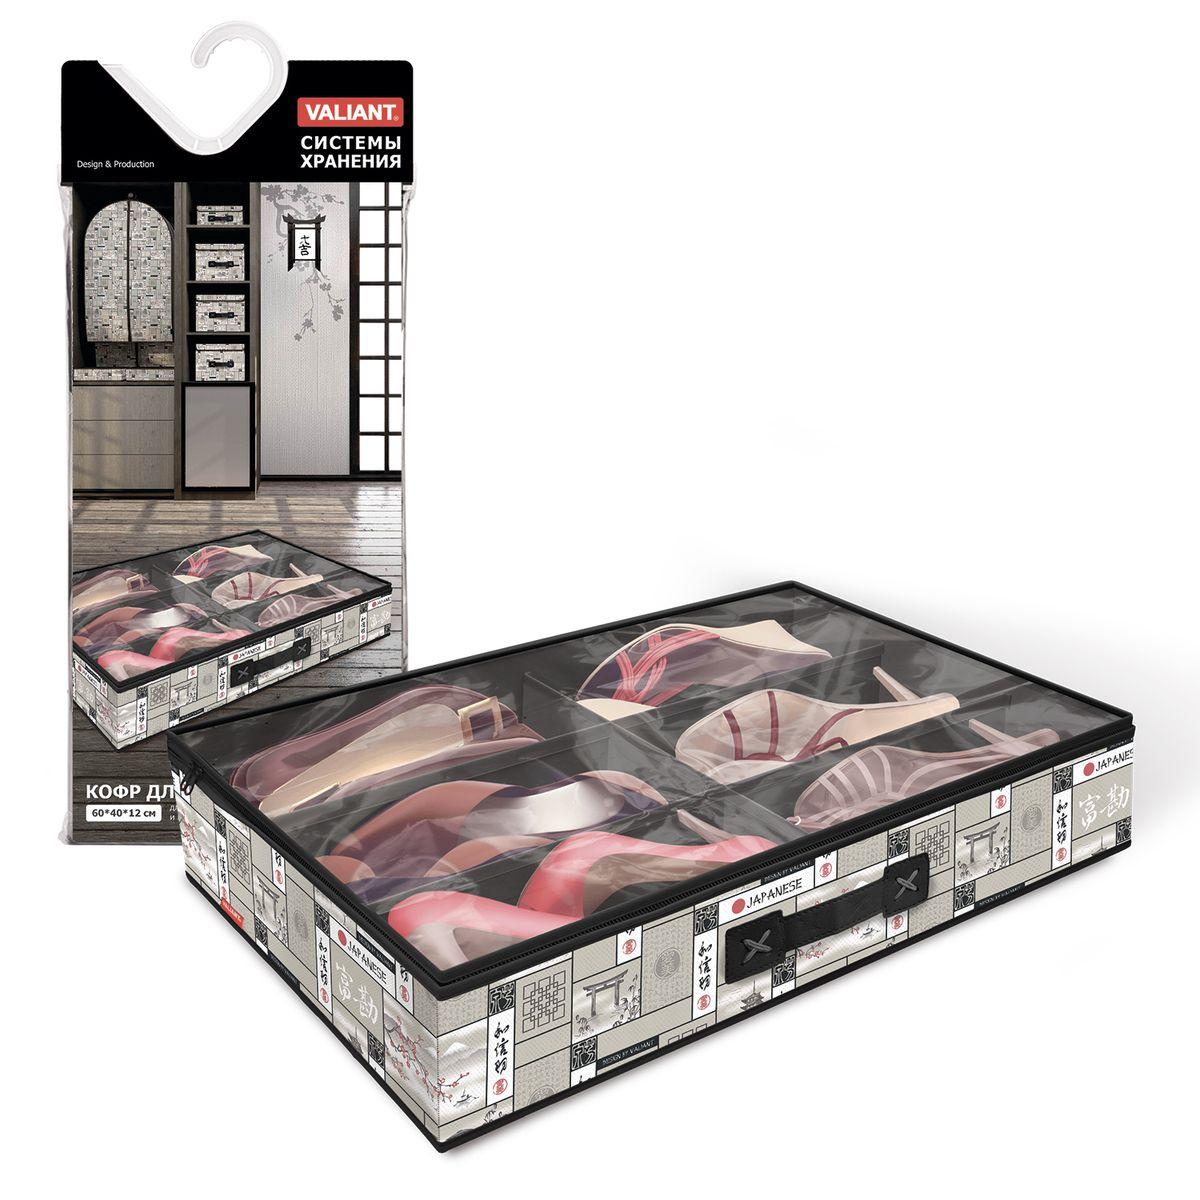 Кофр для хранения обуви Valiant Japanese White, 6 секций, 60 х 40 х 12 см кофр для хранения valiant romantic 60 х 50 х 35 см